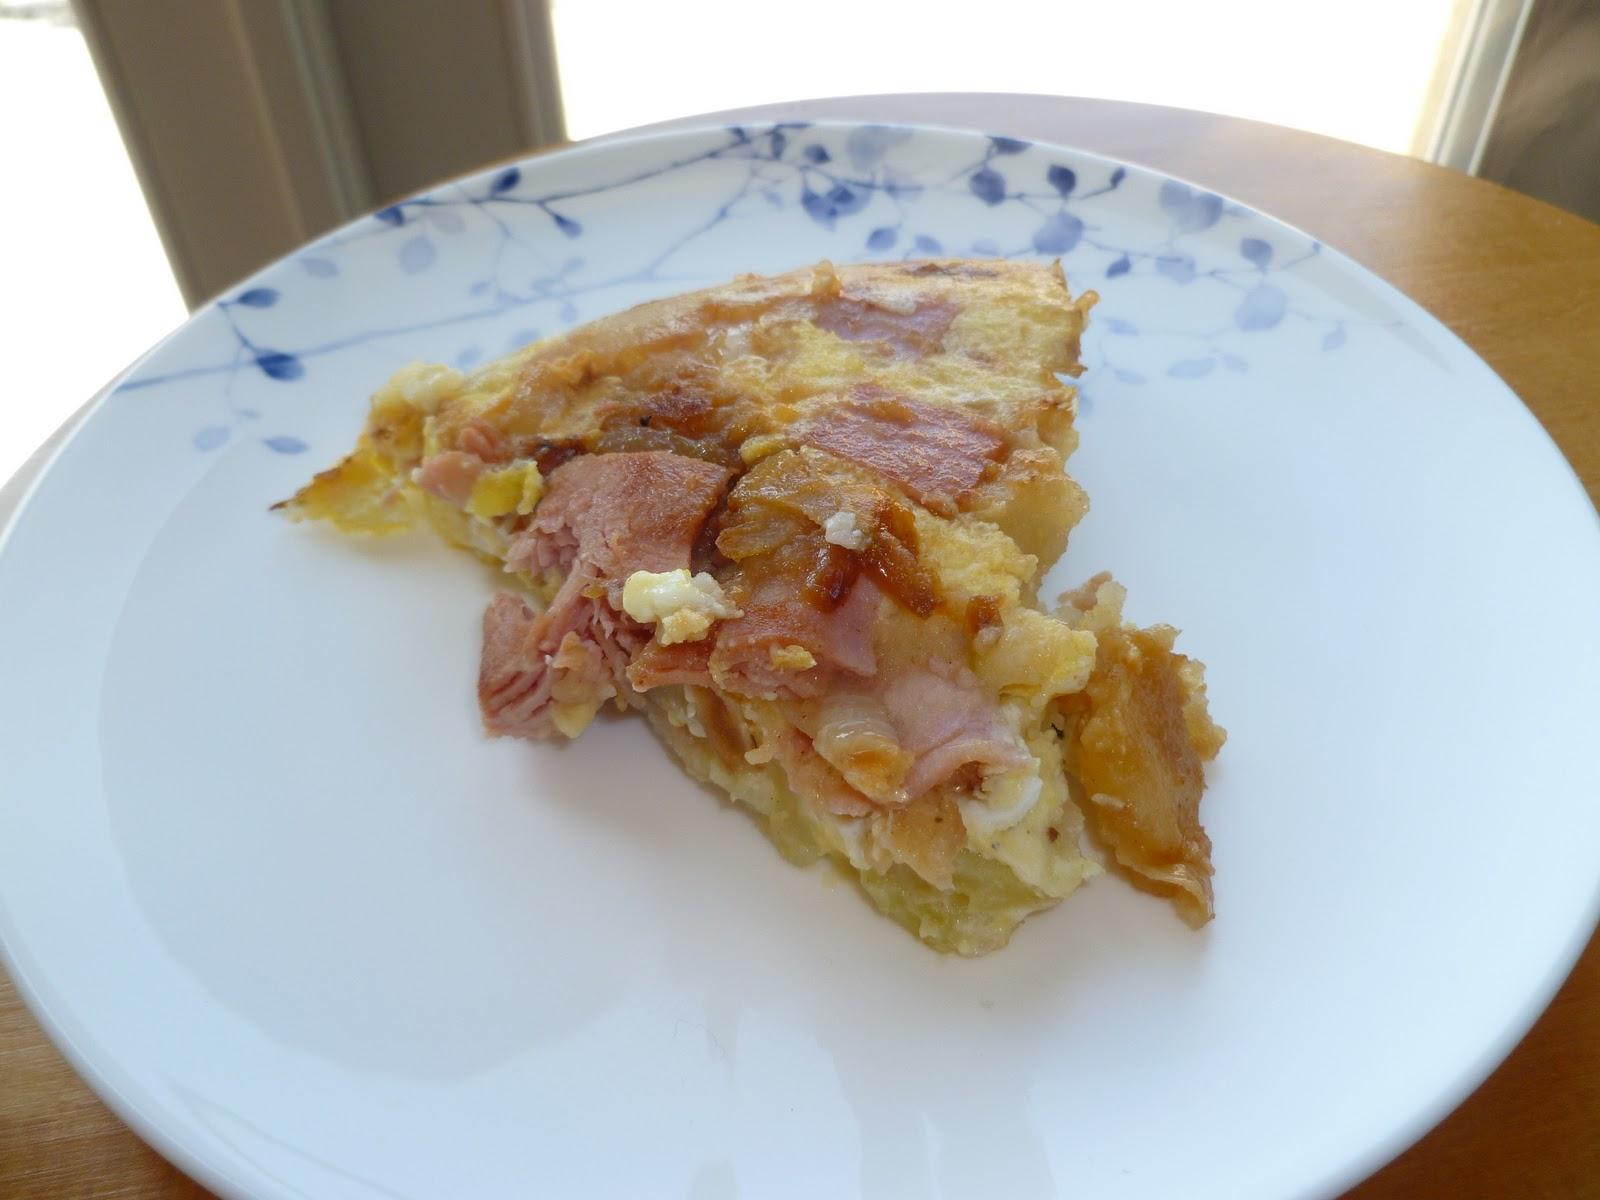 The Pastry Chef's Baking: Potato Onion Frittata